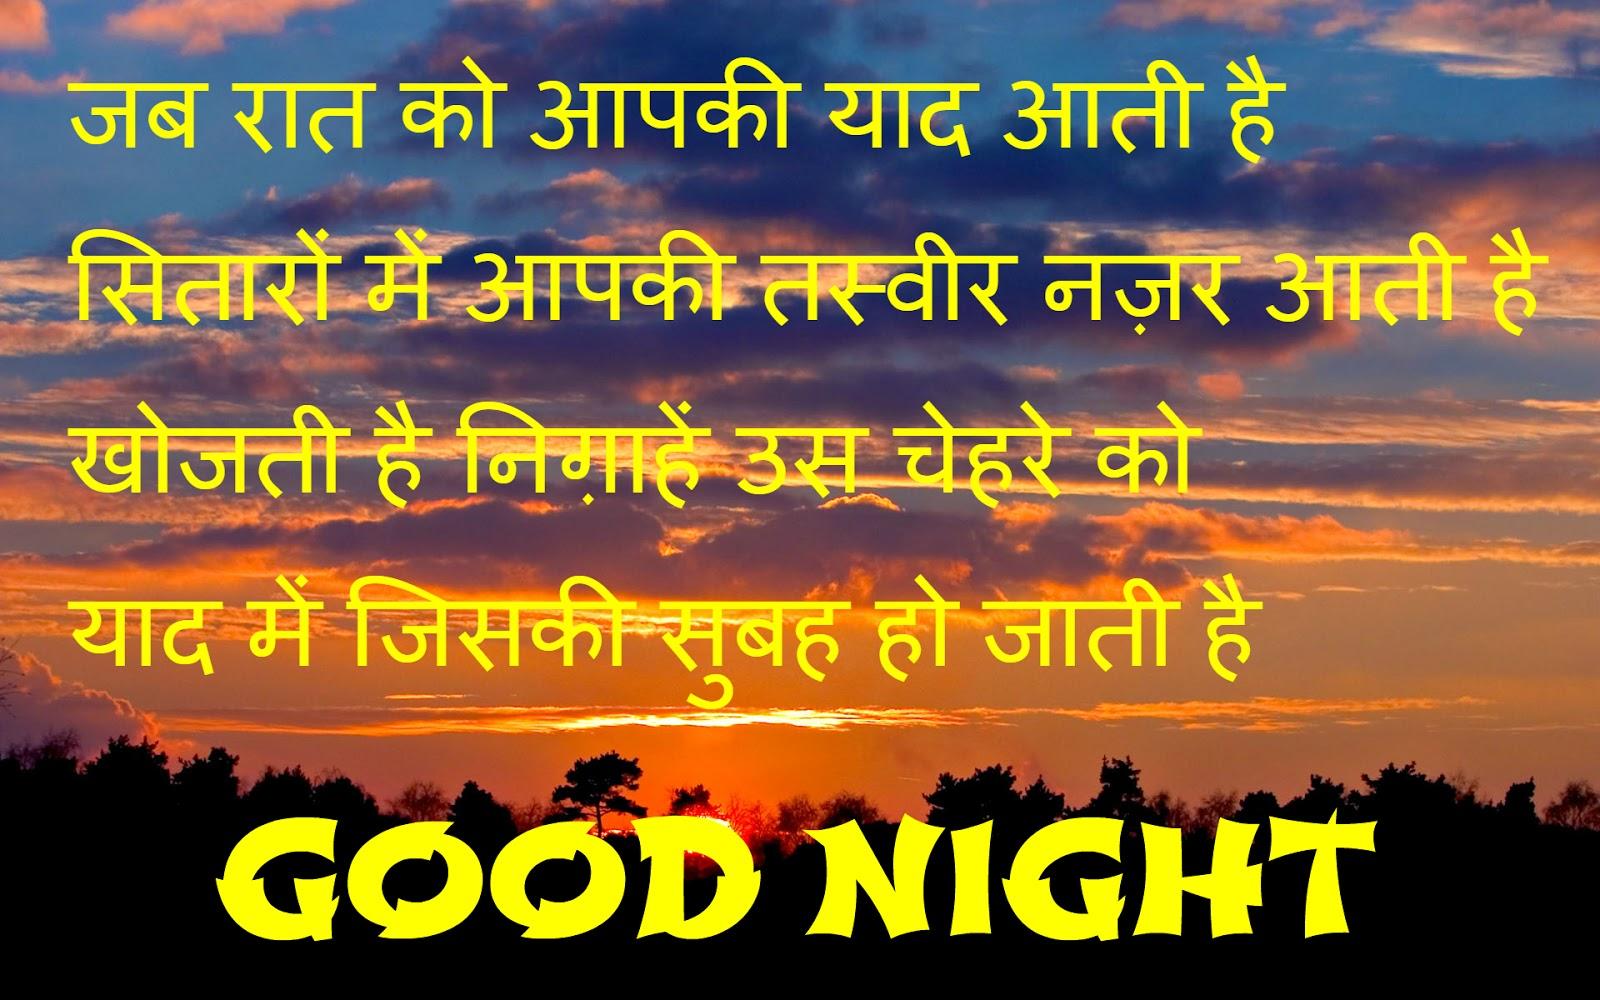 Latest Good Night Sms Good Night Wishes Good Night Whatsapp